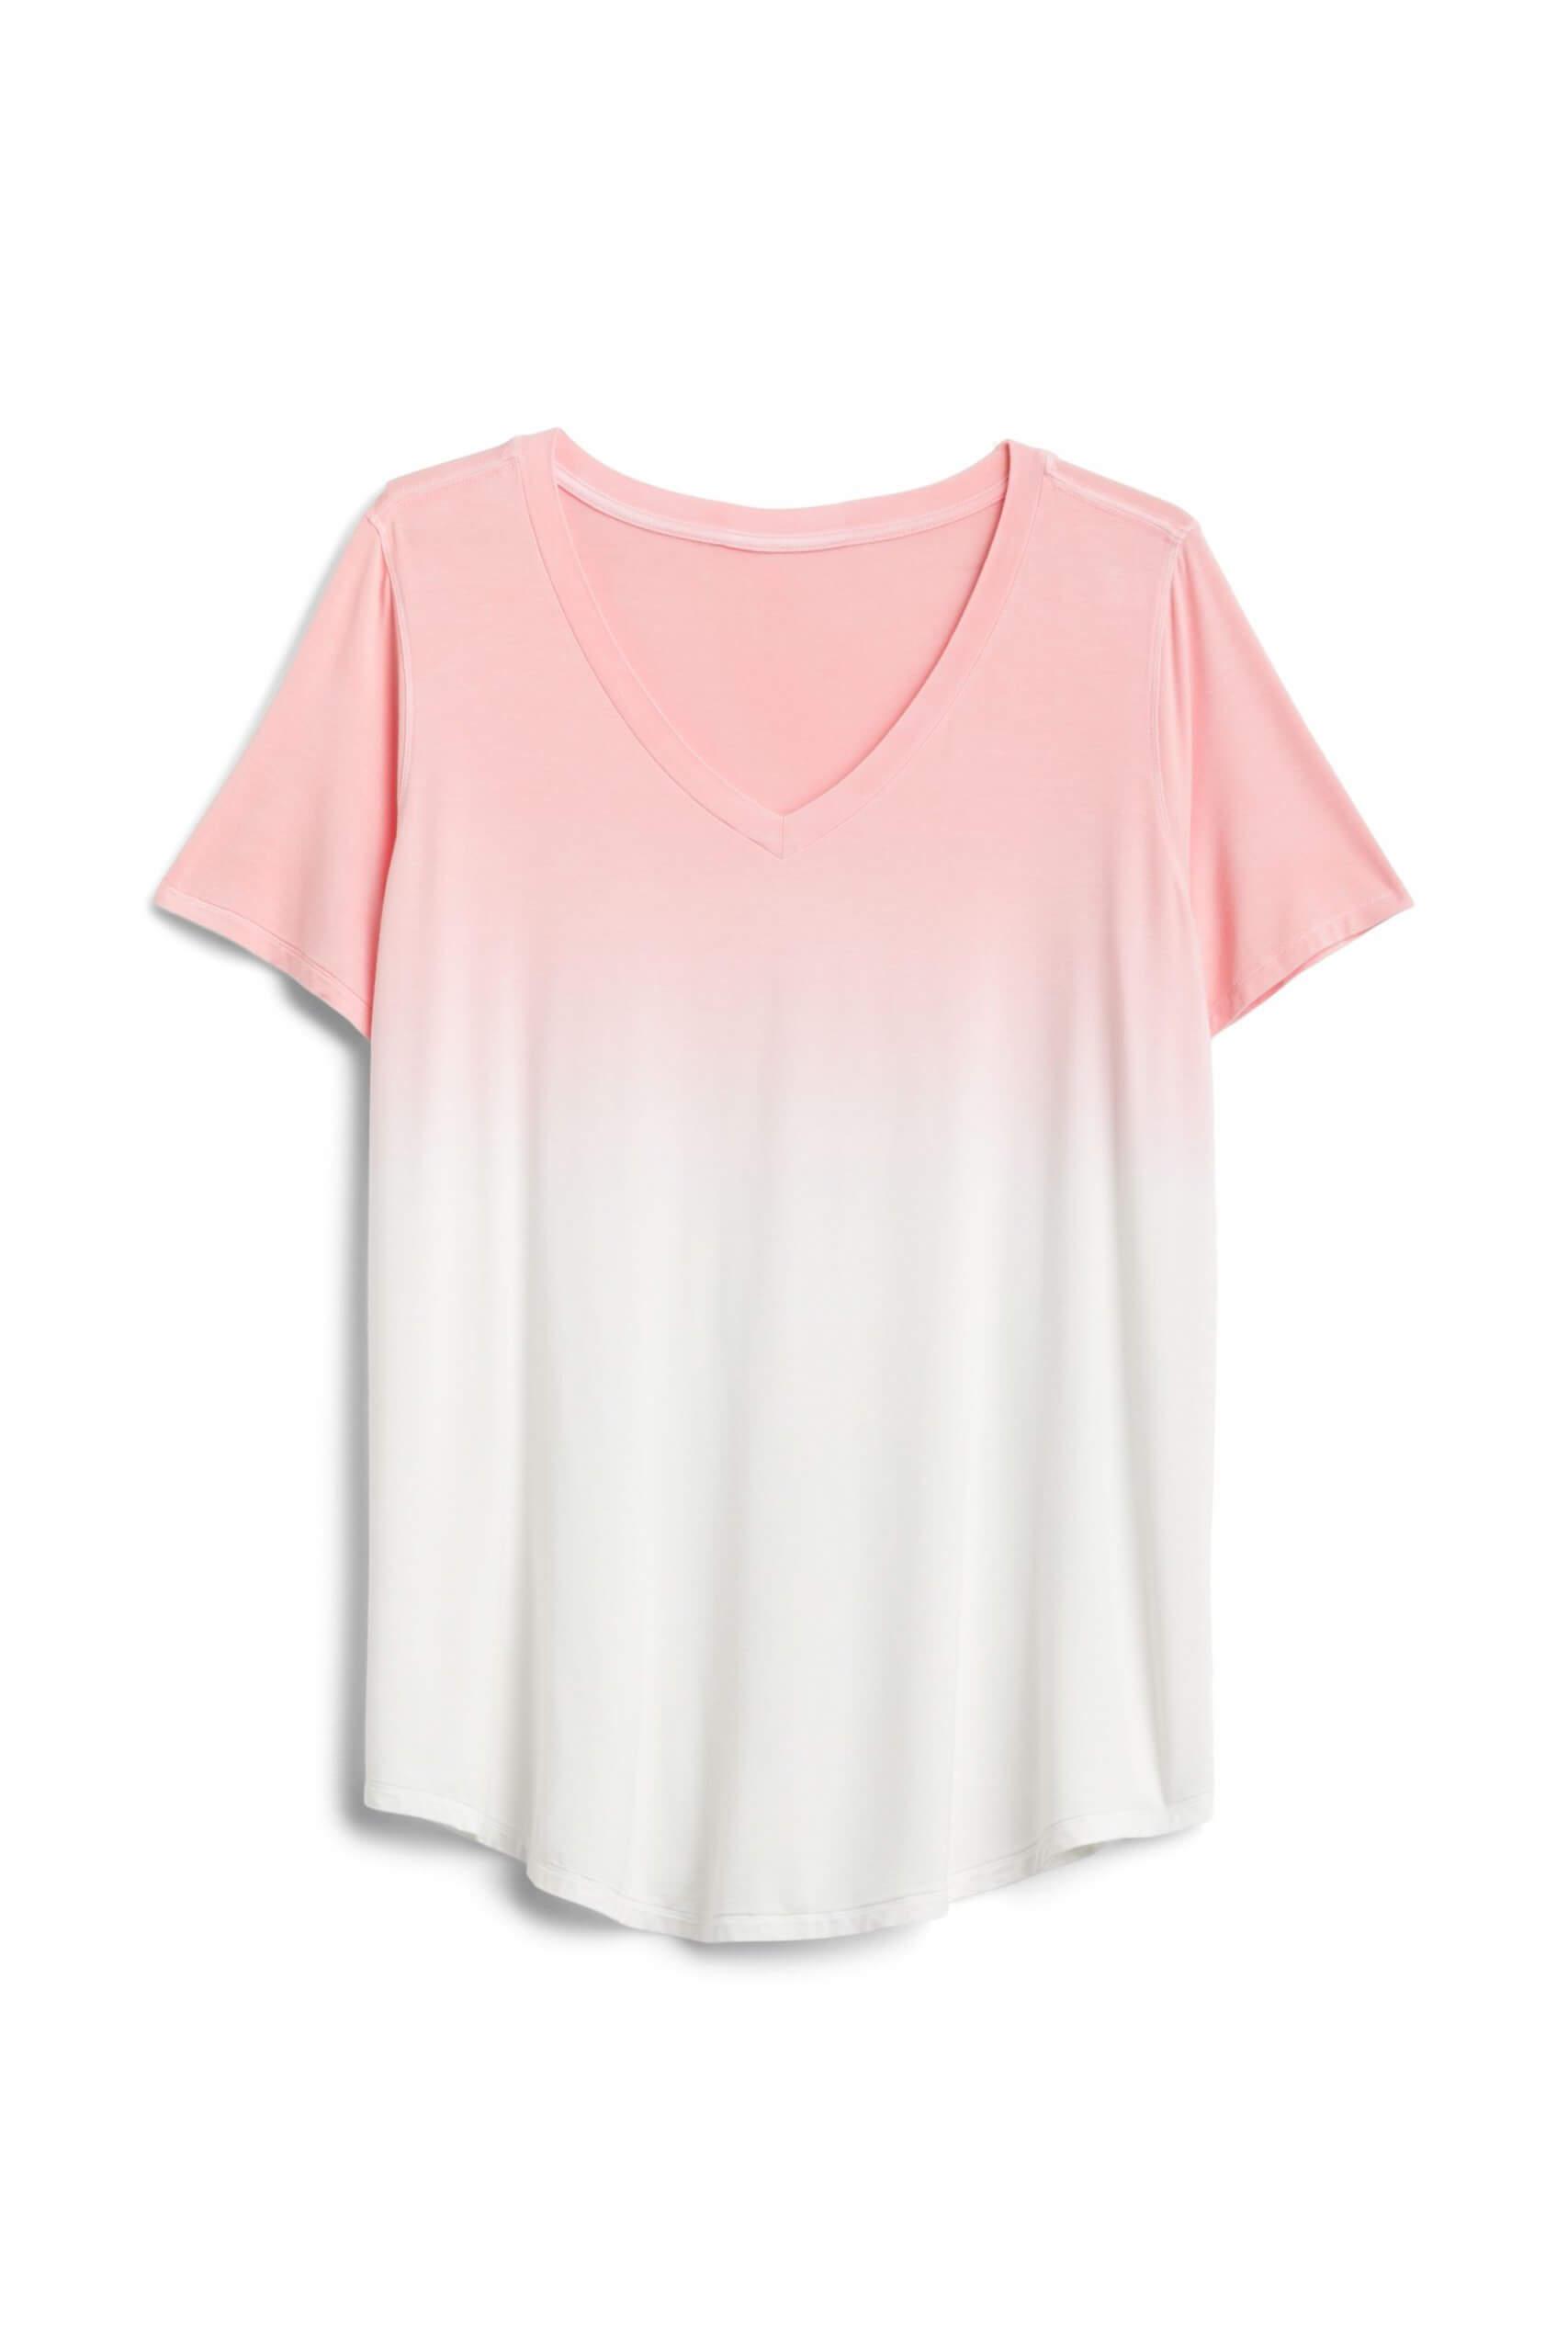 Stitch Fix Women's pink and white dip-dye t-shirt with v-neckline.